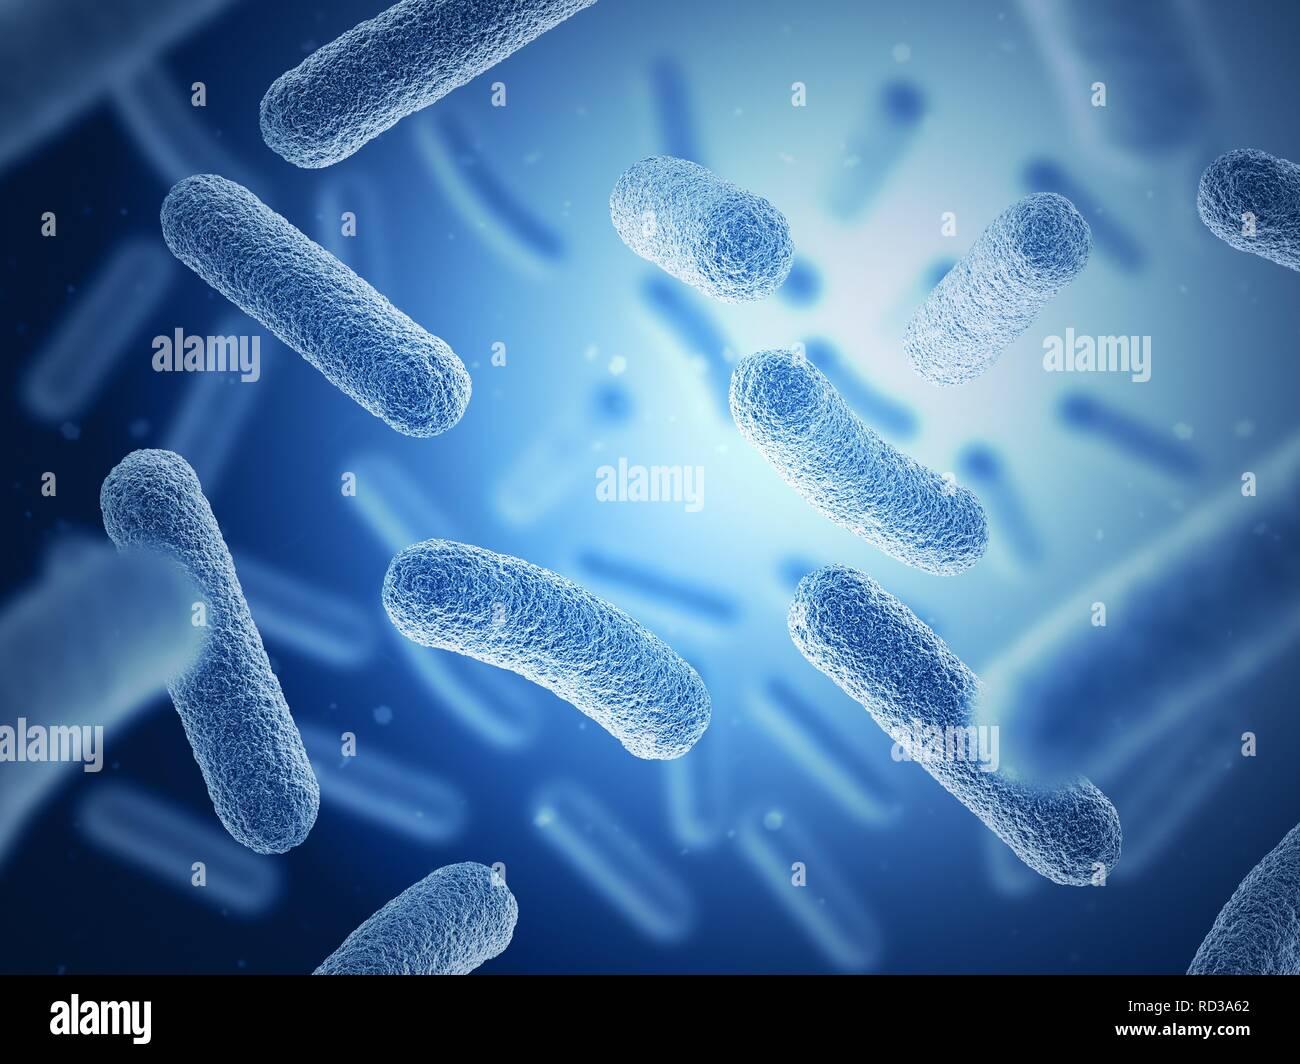 Bacteria on blue background - Stock Image